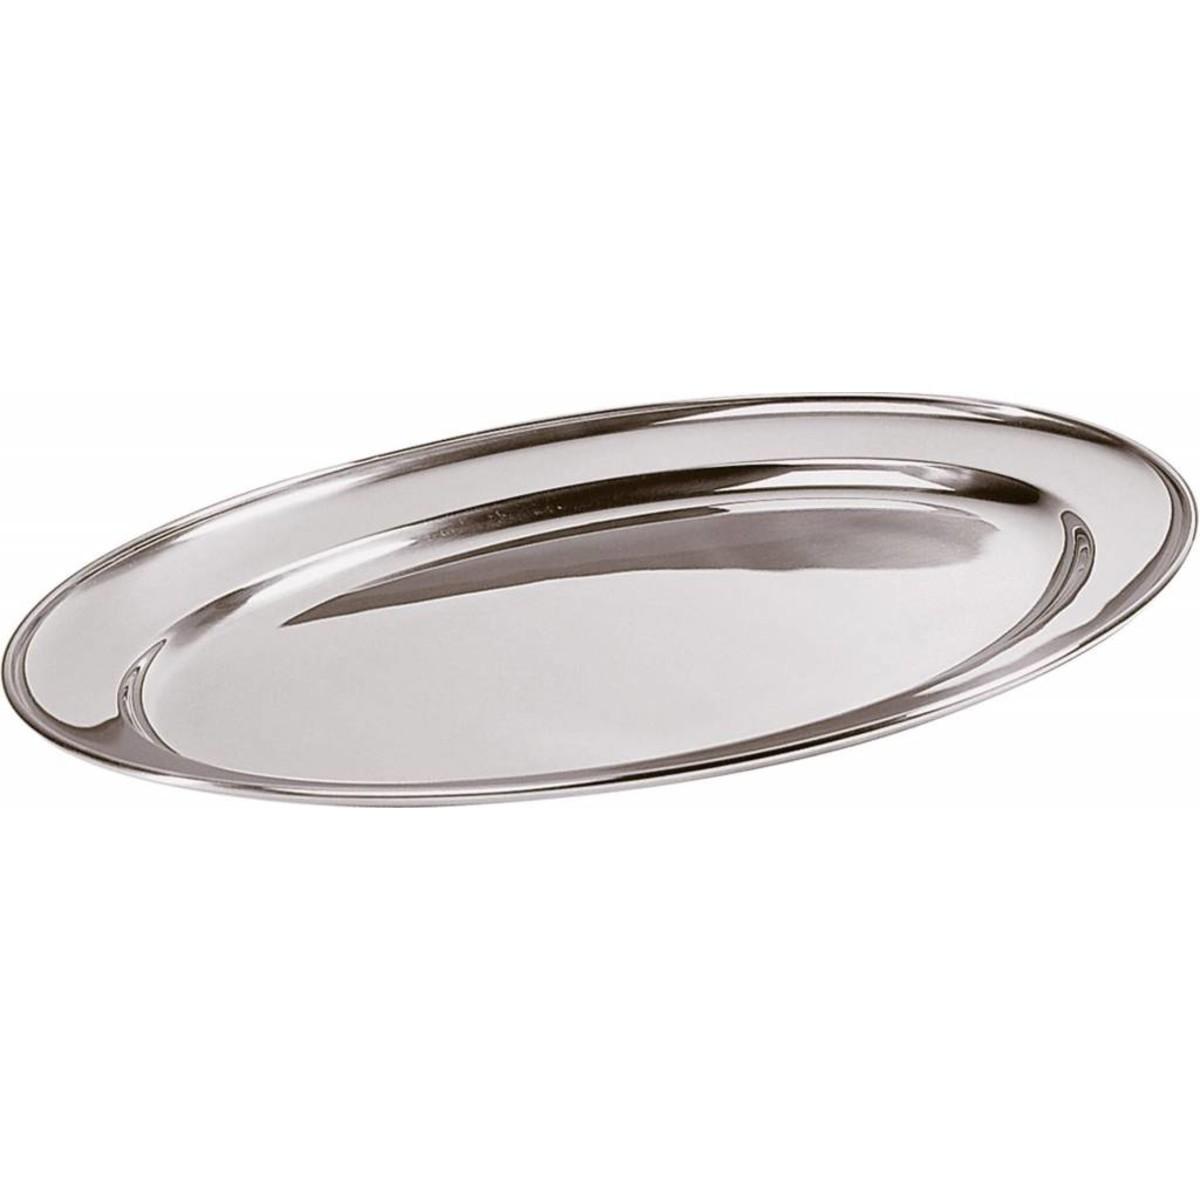 Bratenplatte/Servierplatte oval 35x22cm